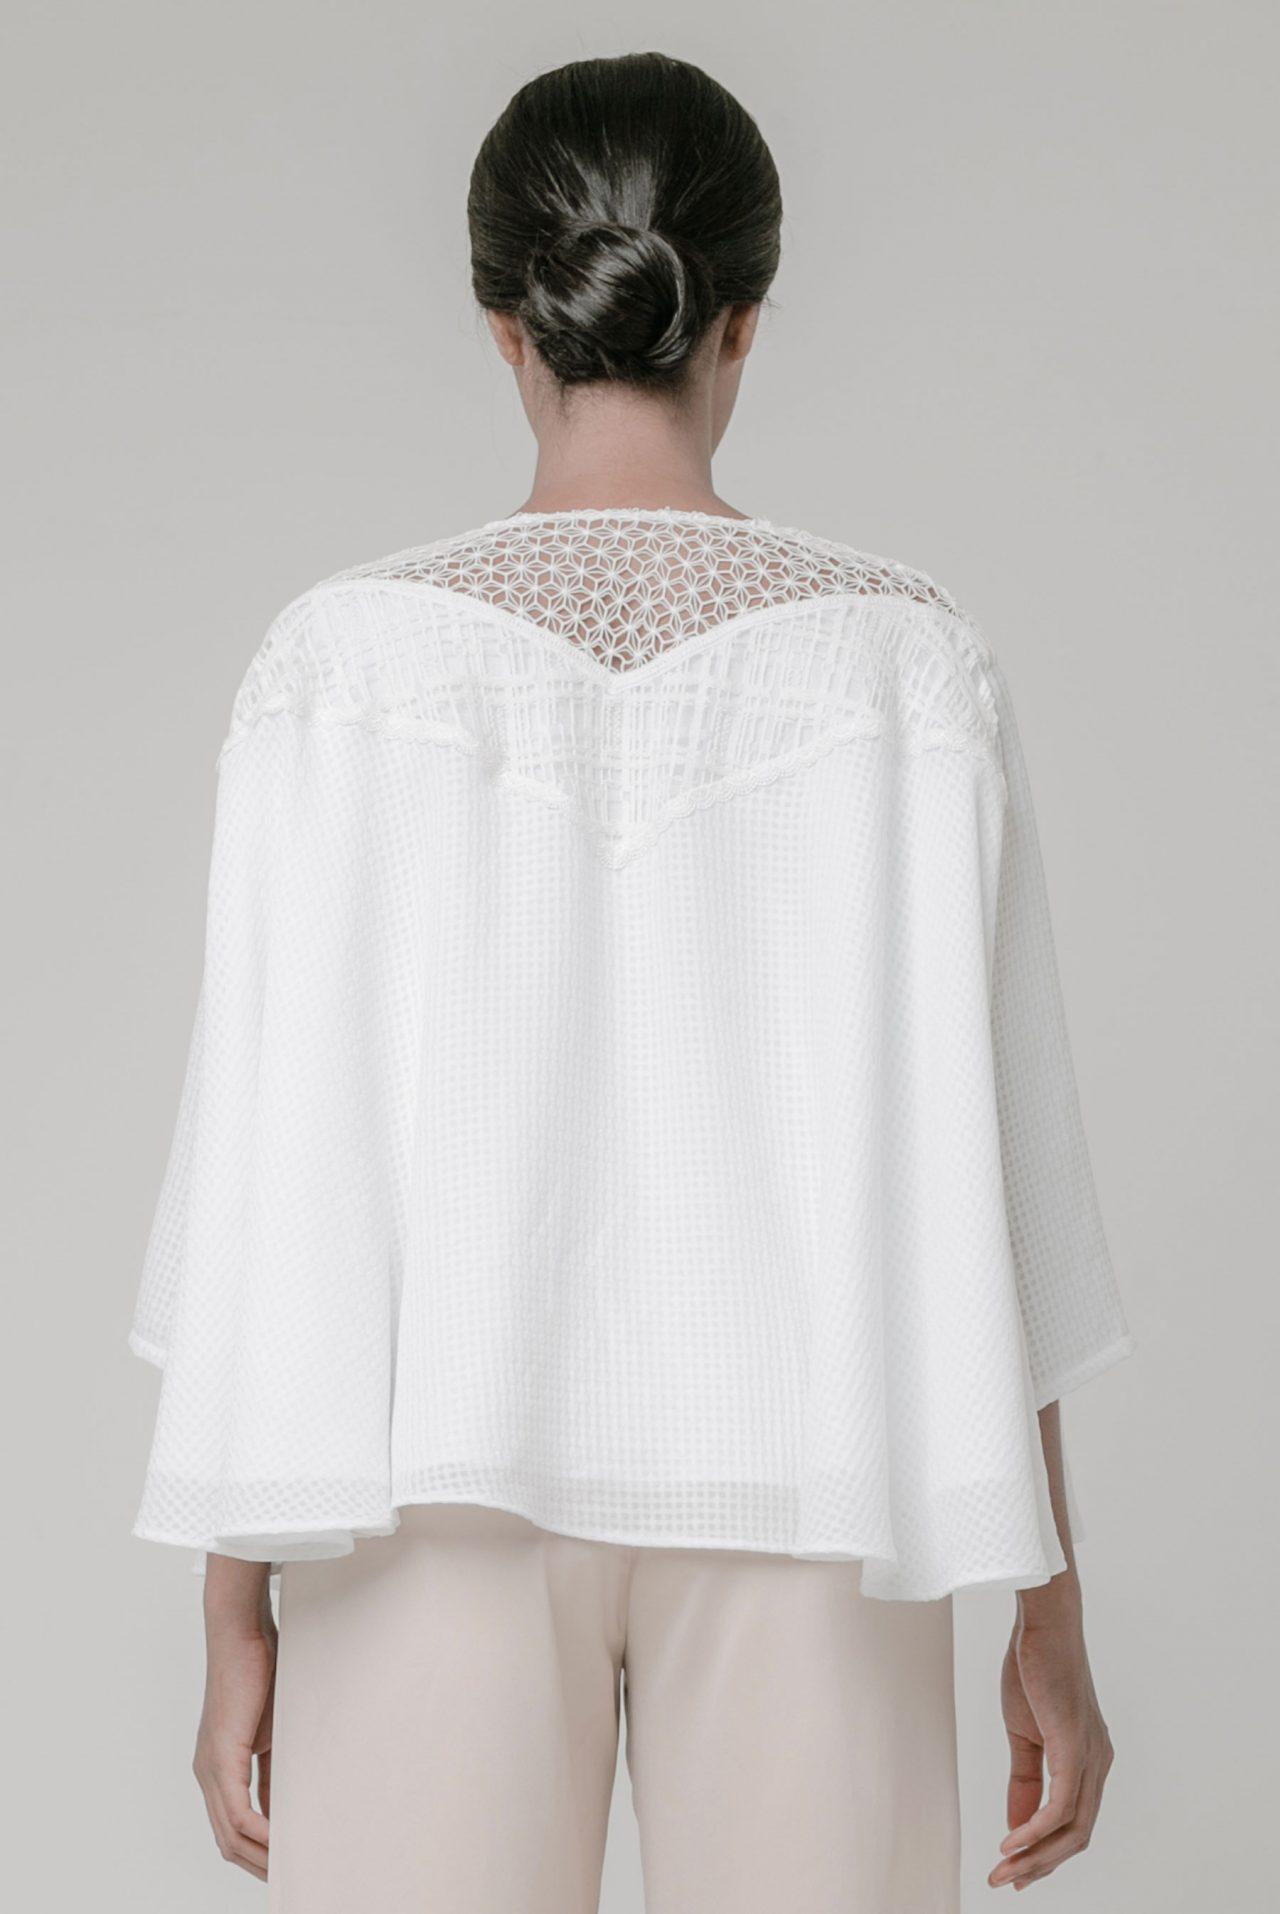 10206-white-cotton-lace-tunic3